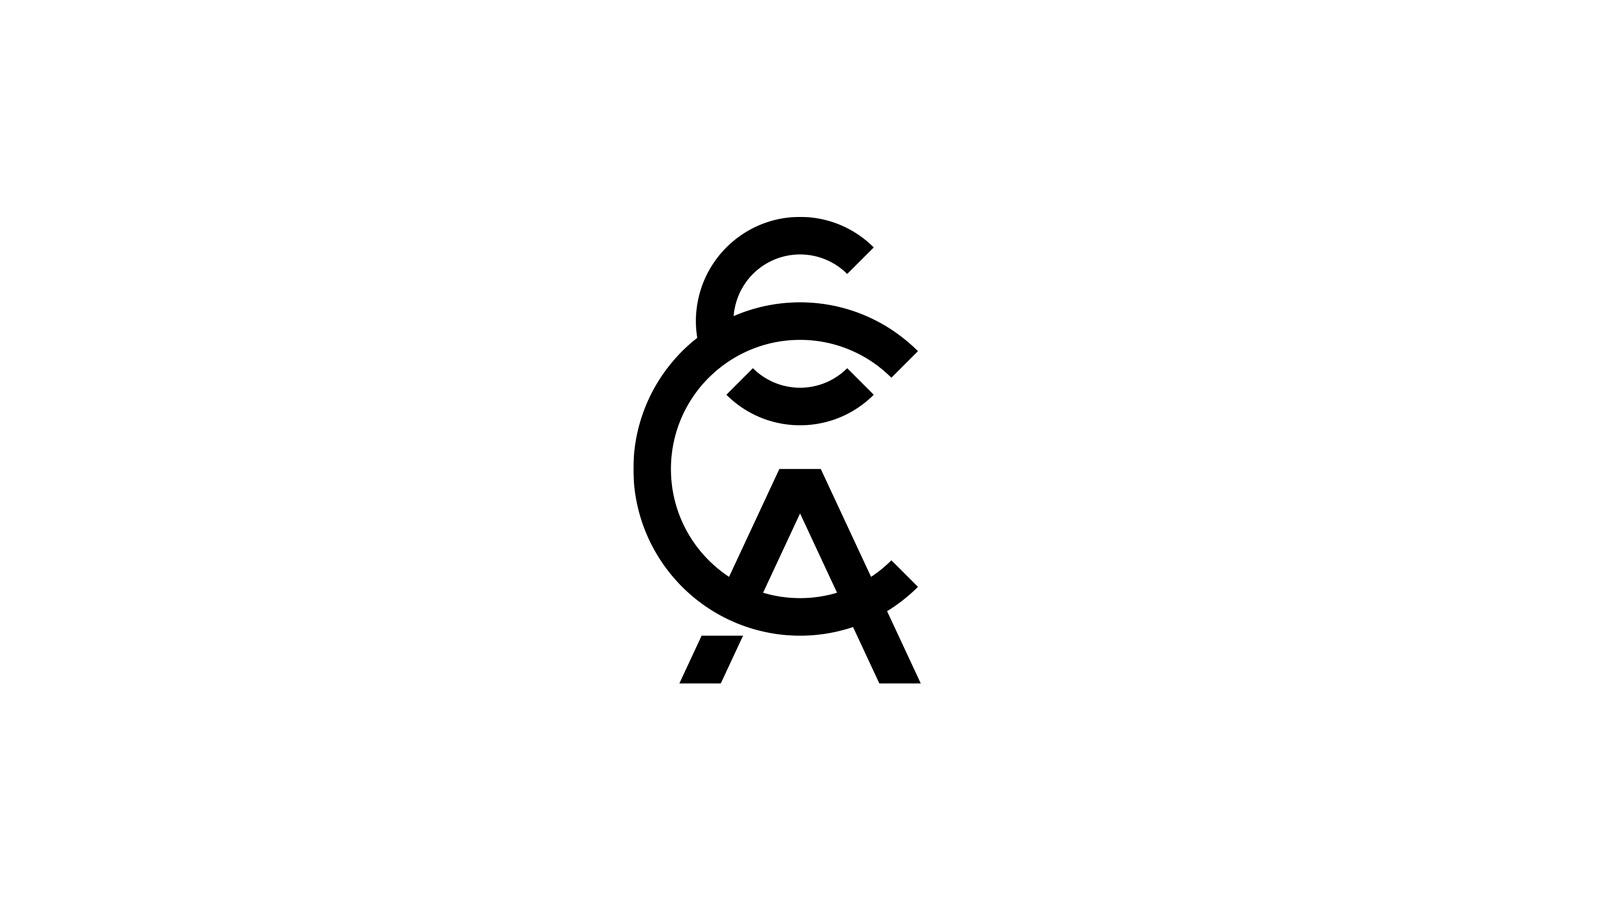 cca-logo-1